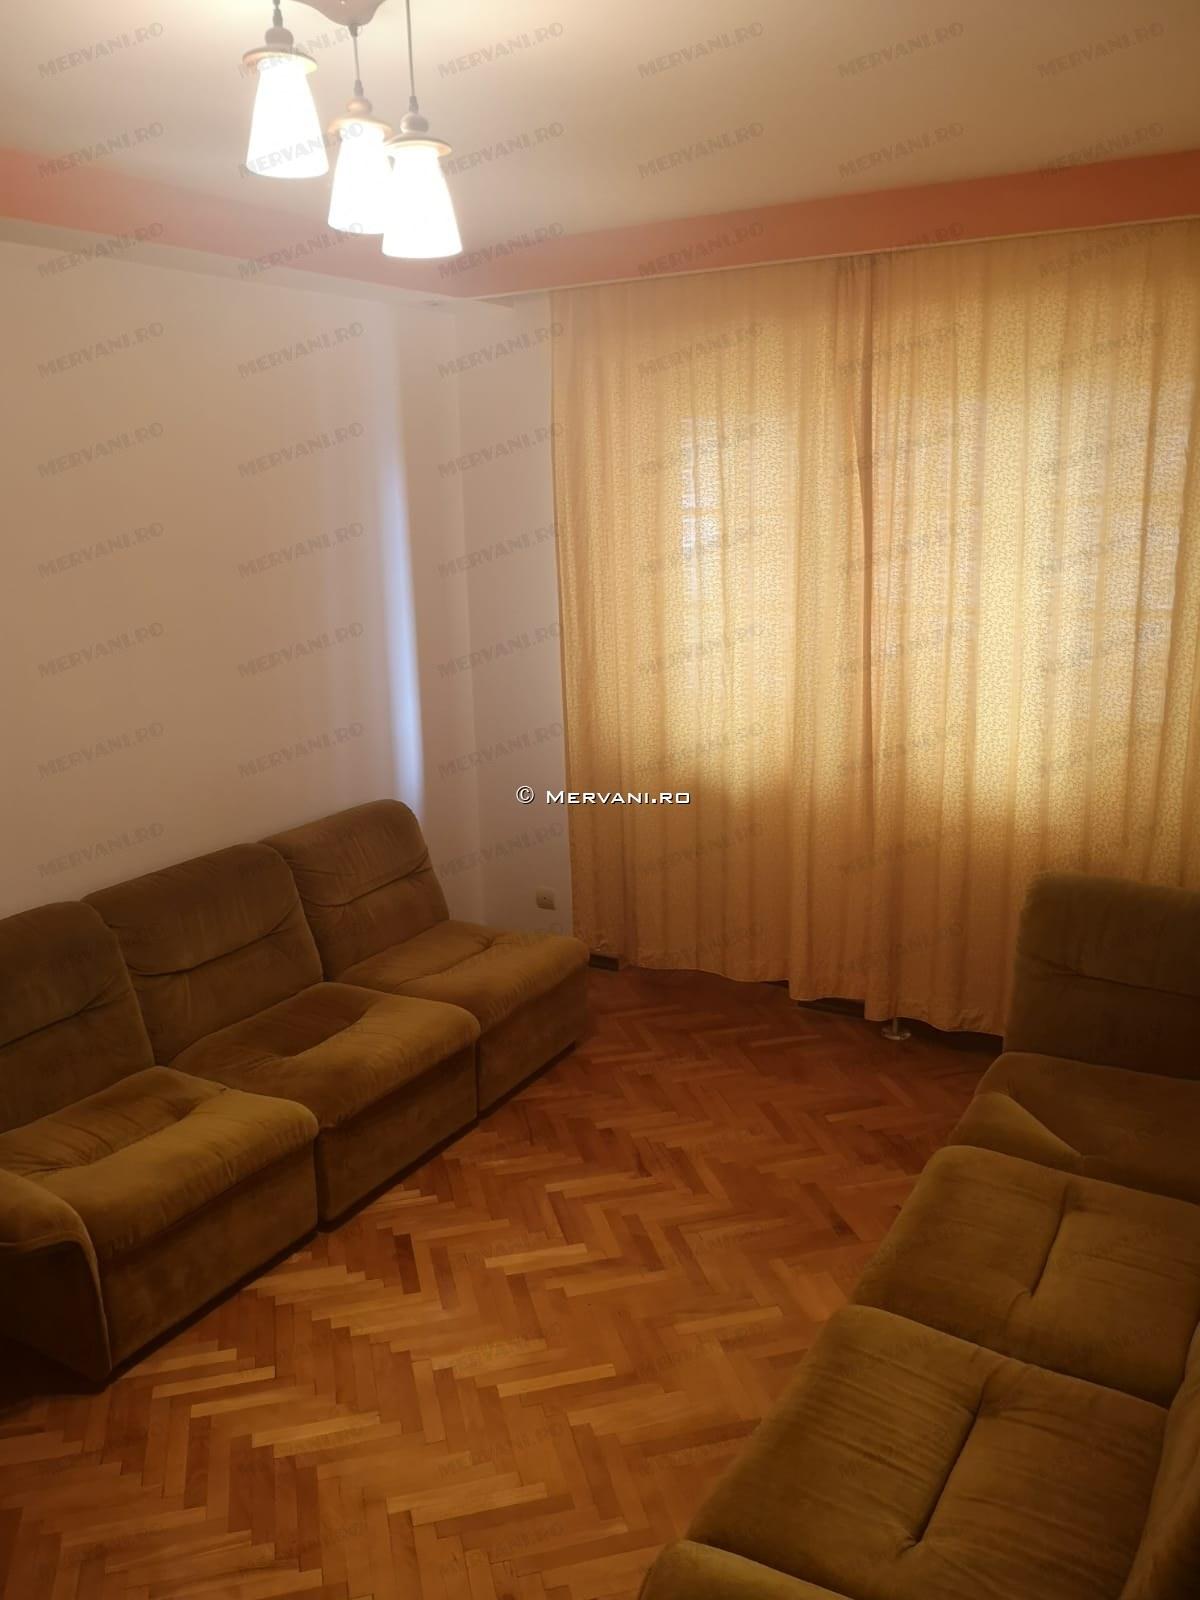 Apartament de Inchiriat in Campina, 250 €